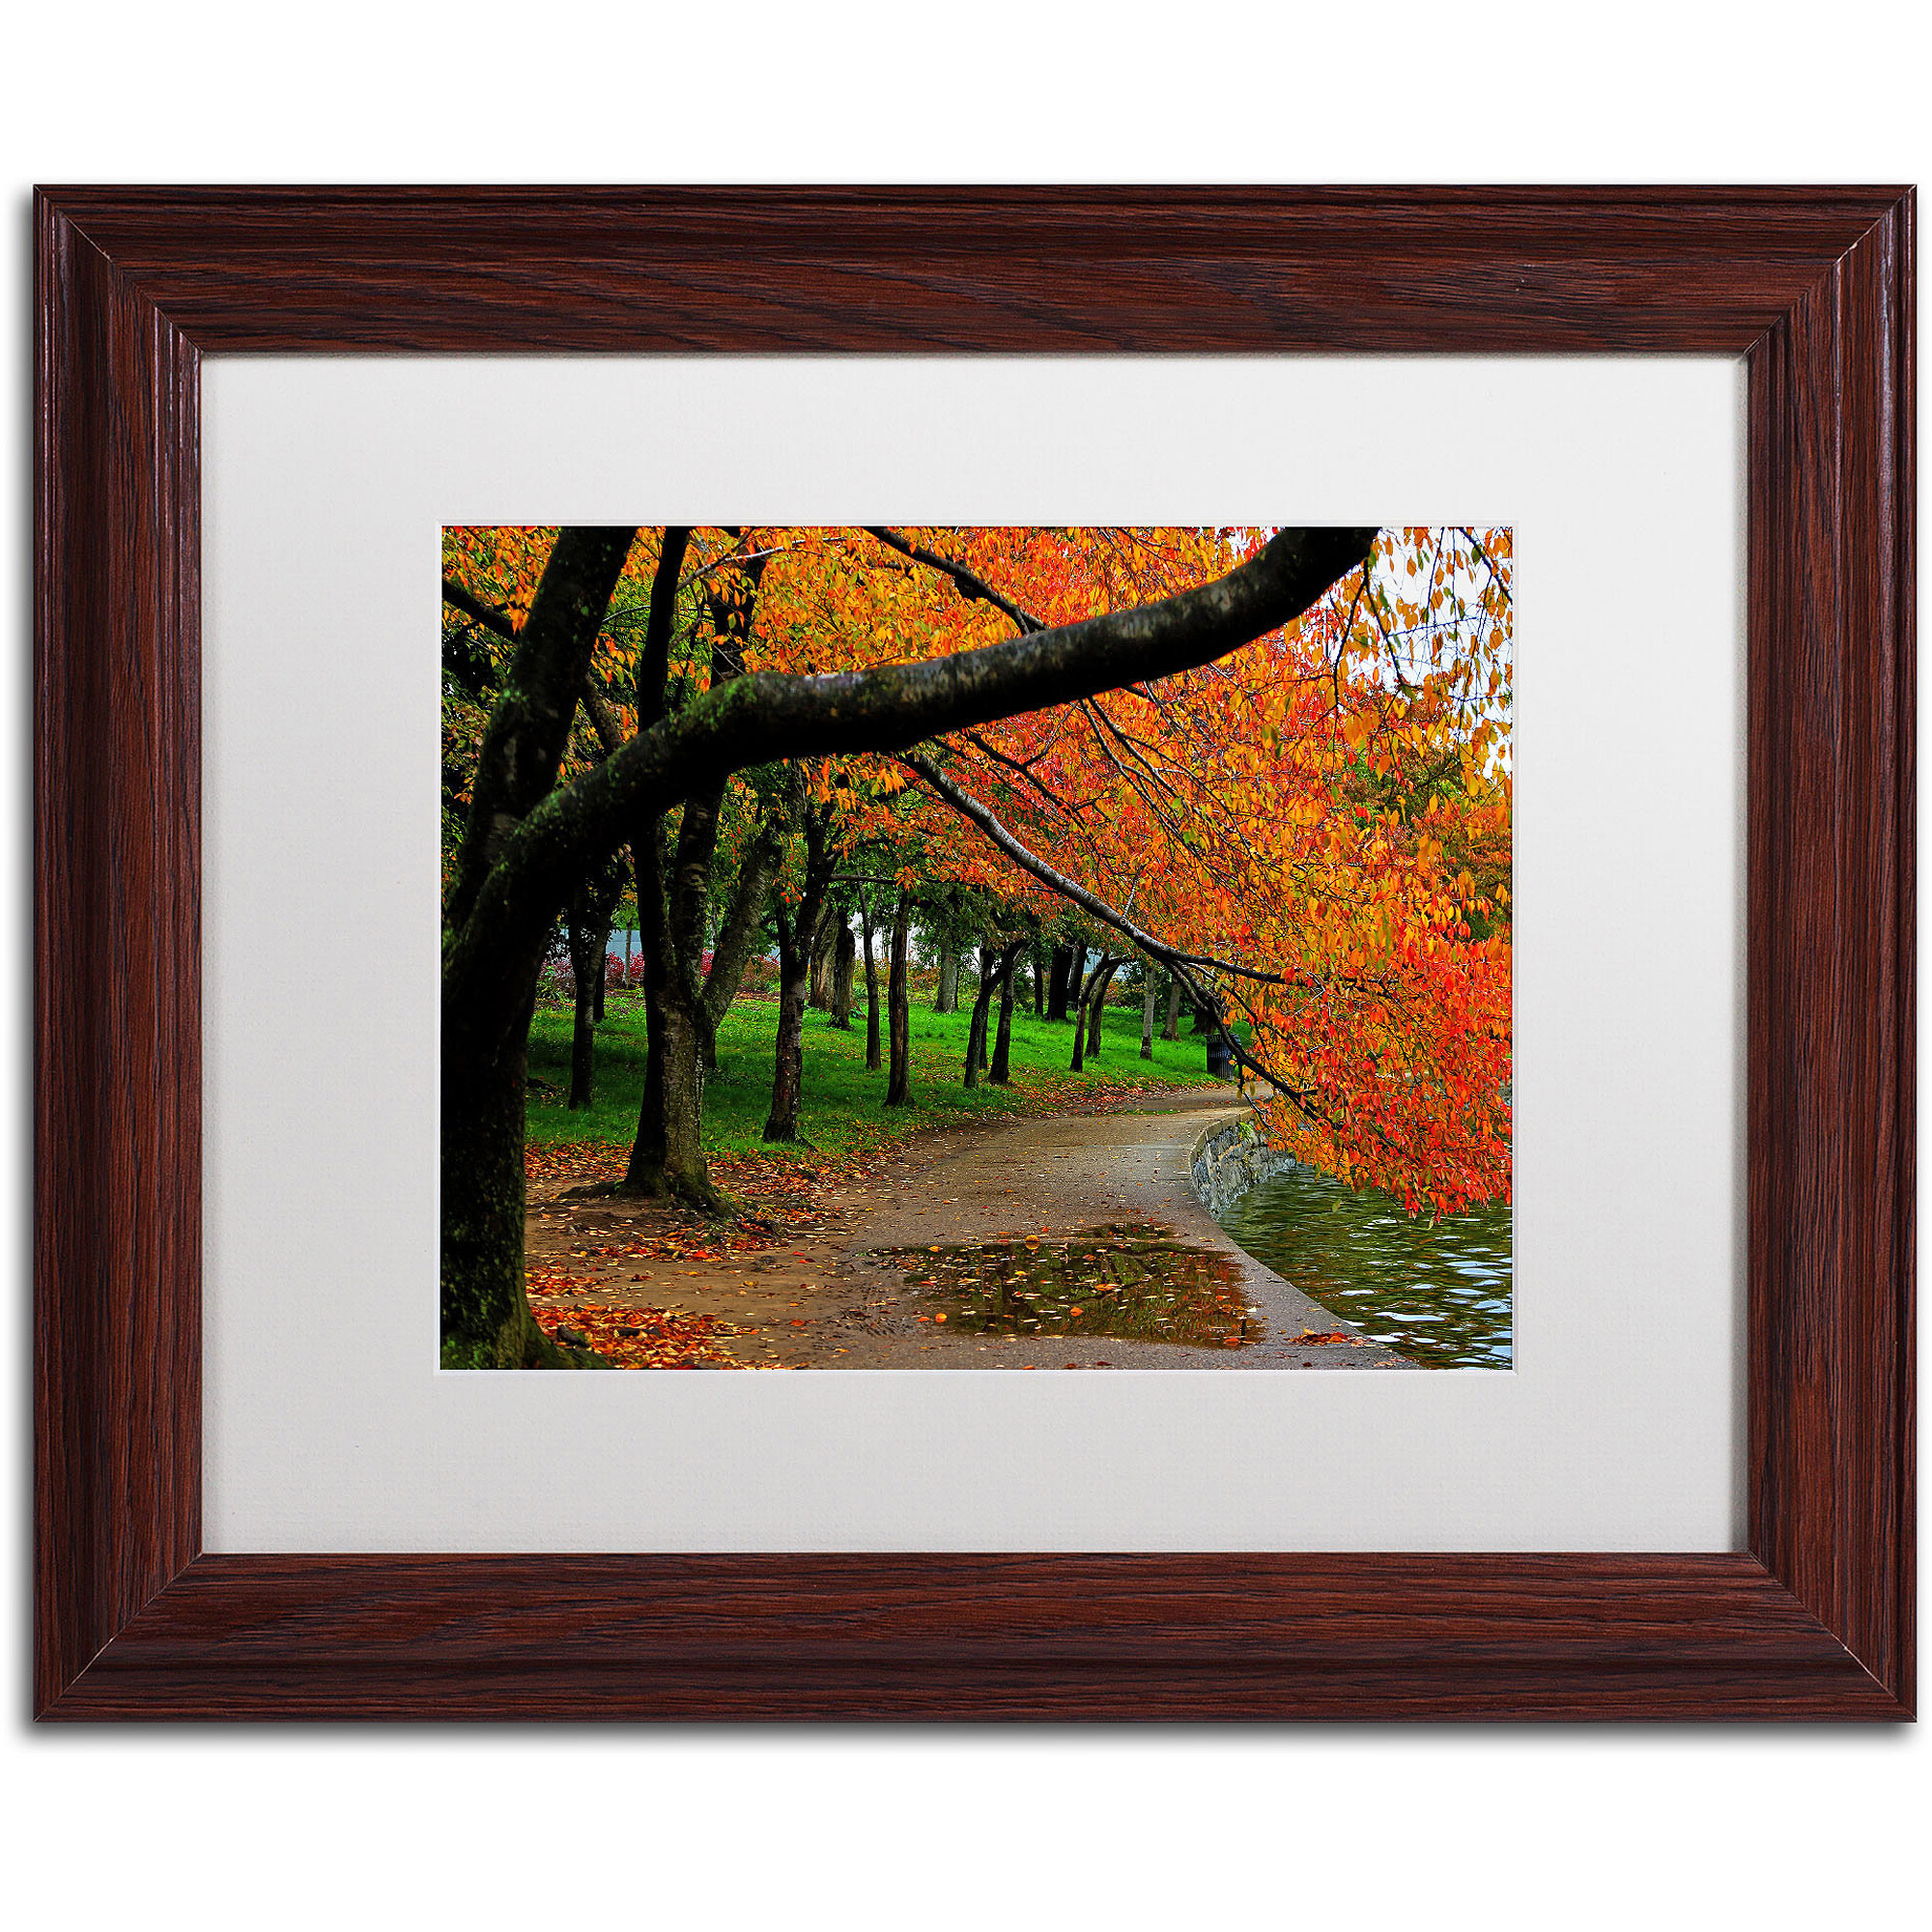 "Trademark Fine Art ""Tidal Basin Autumn 2"" Canvas Art by CATeyes, White Matte, Wood Frame"